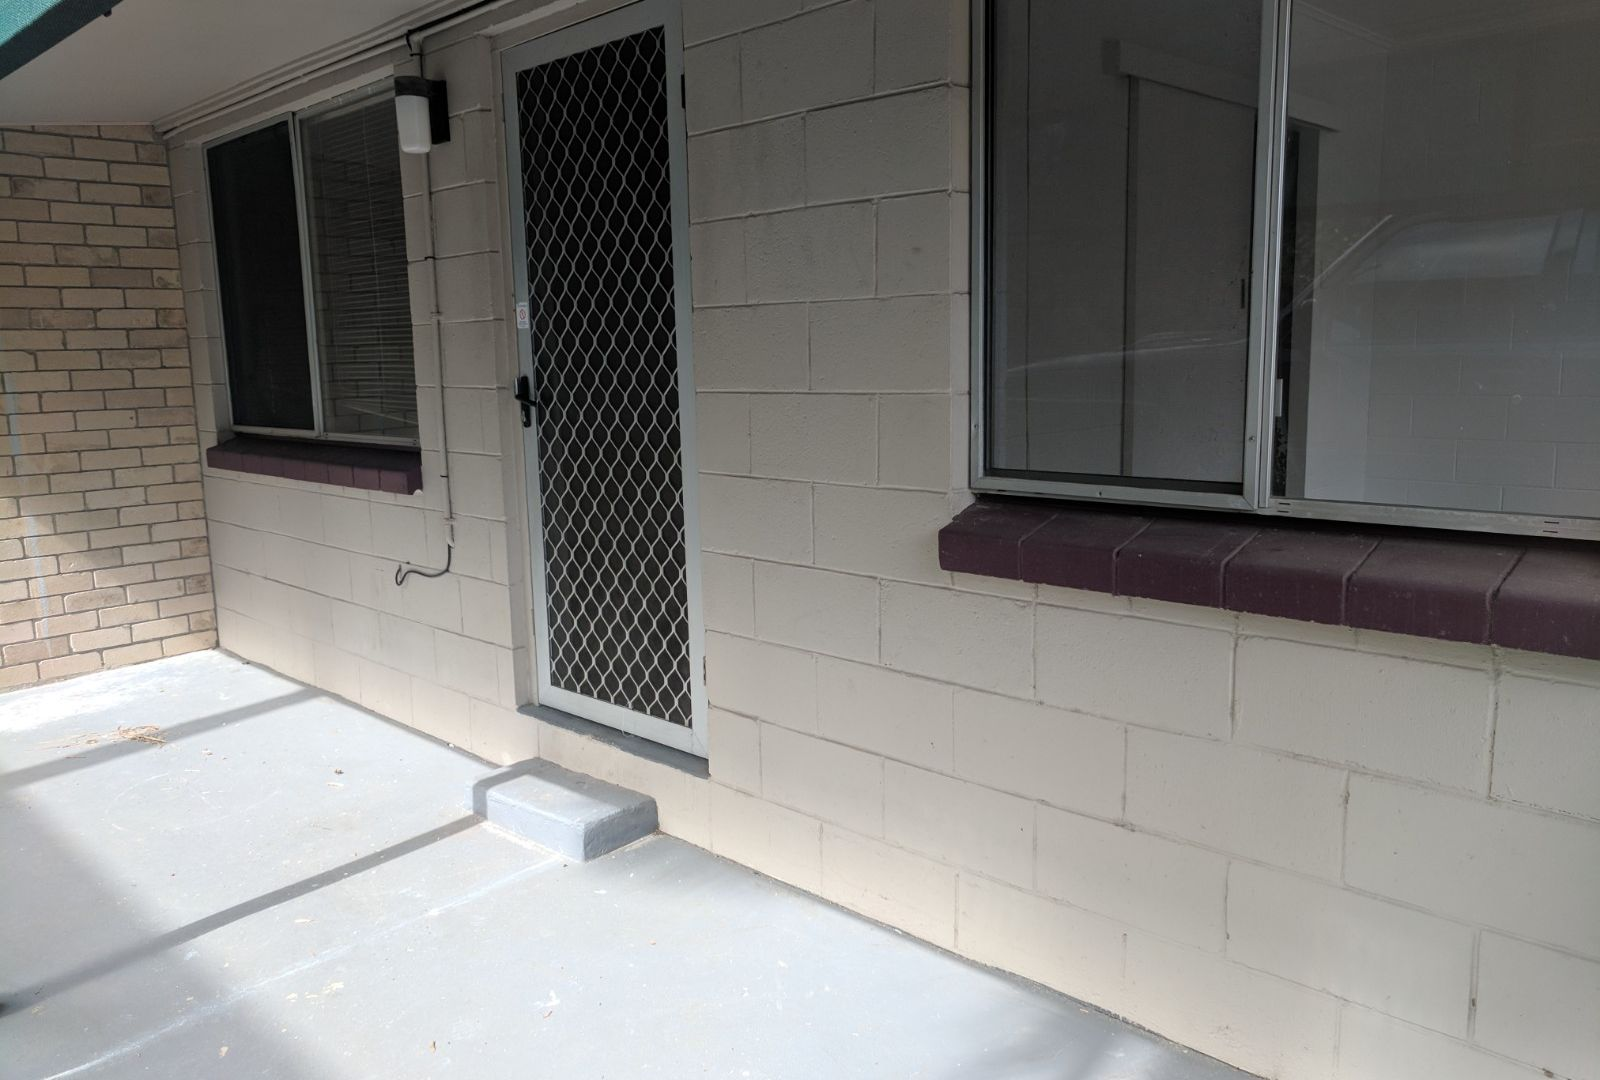 3/54 Hilton Tce, Tewantin QLD 4565, Image 1